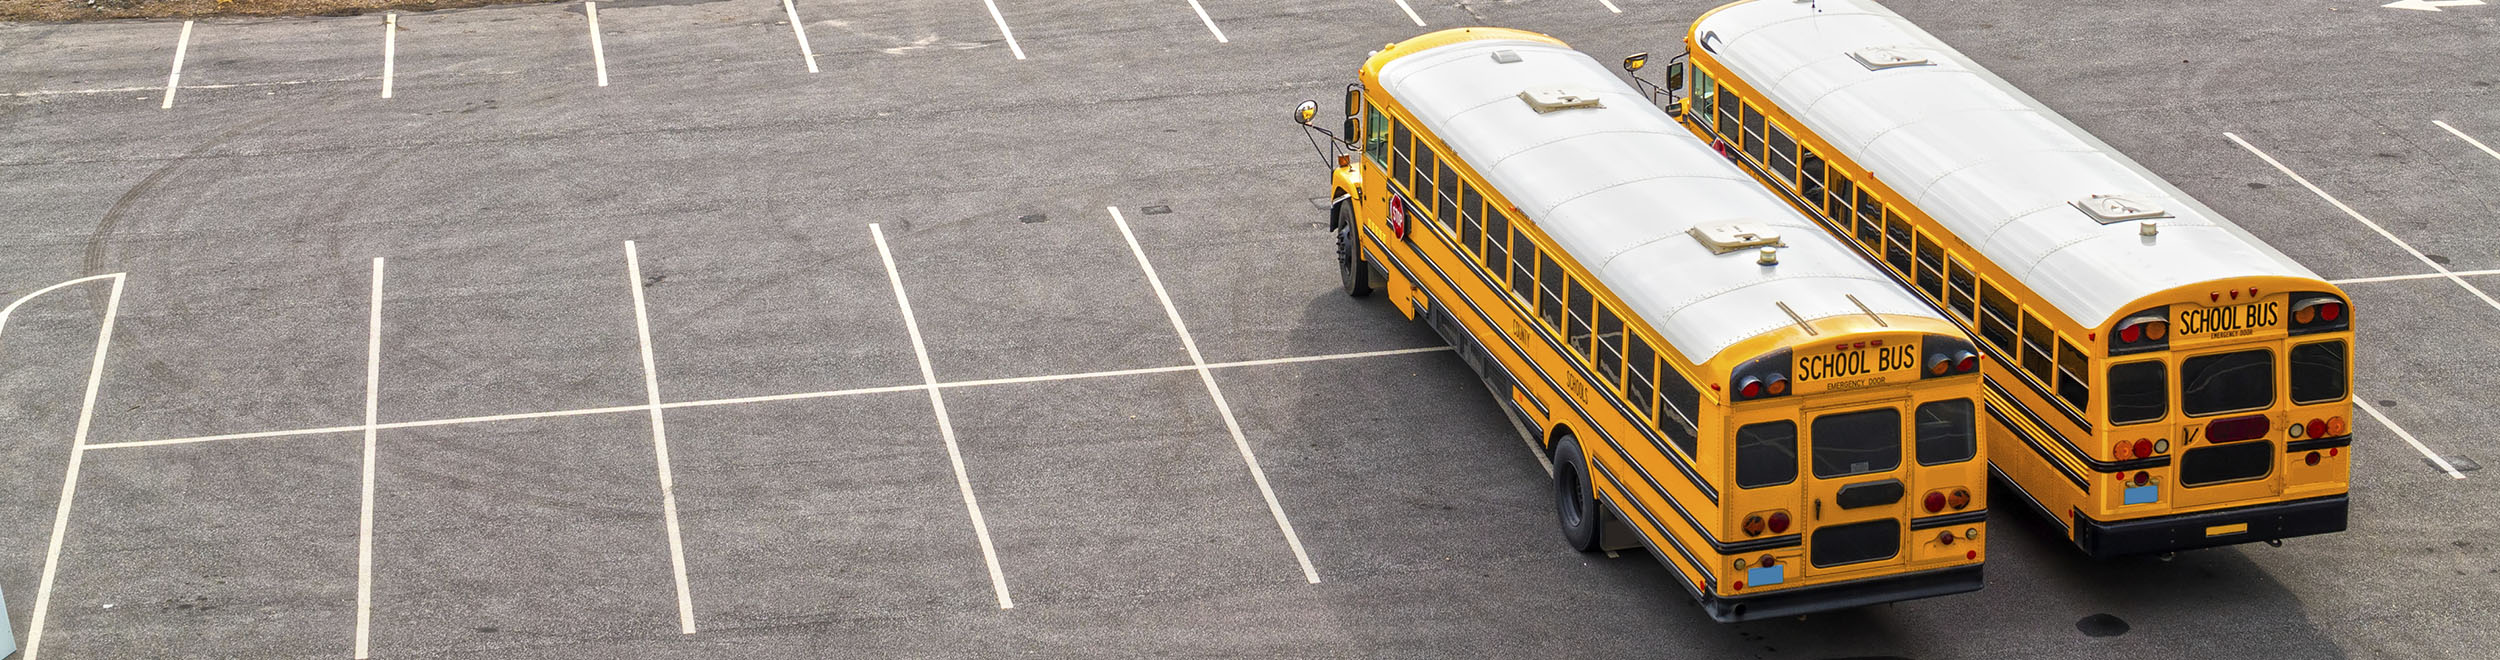 Bus Transportation Management Videos